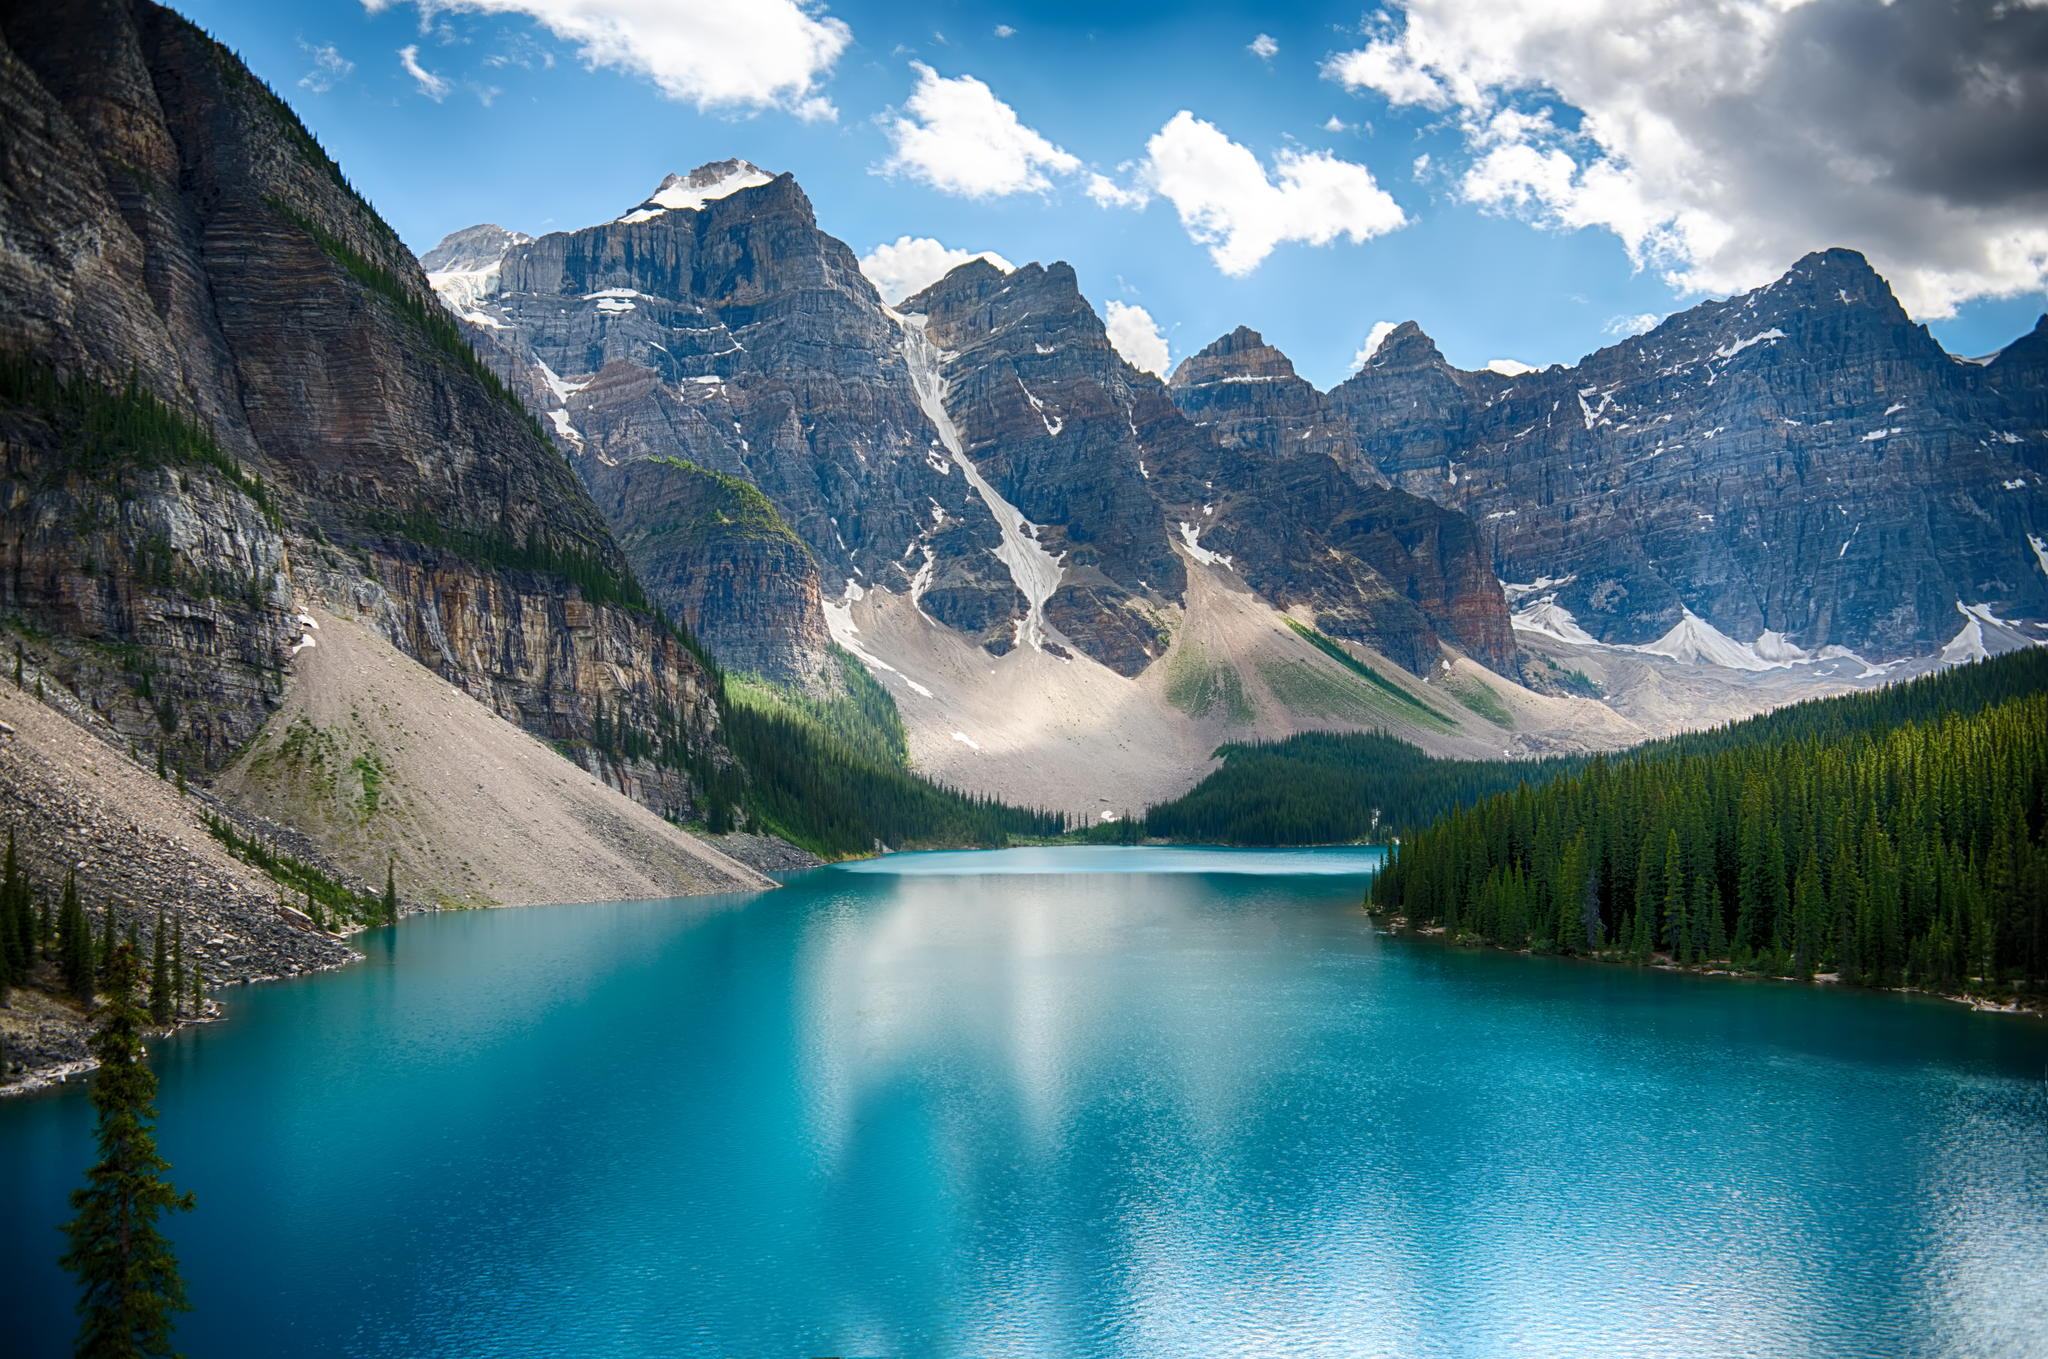 Moraine Lake in Banff National Park, 2012